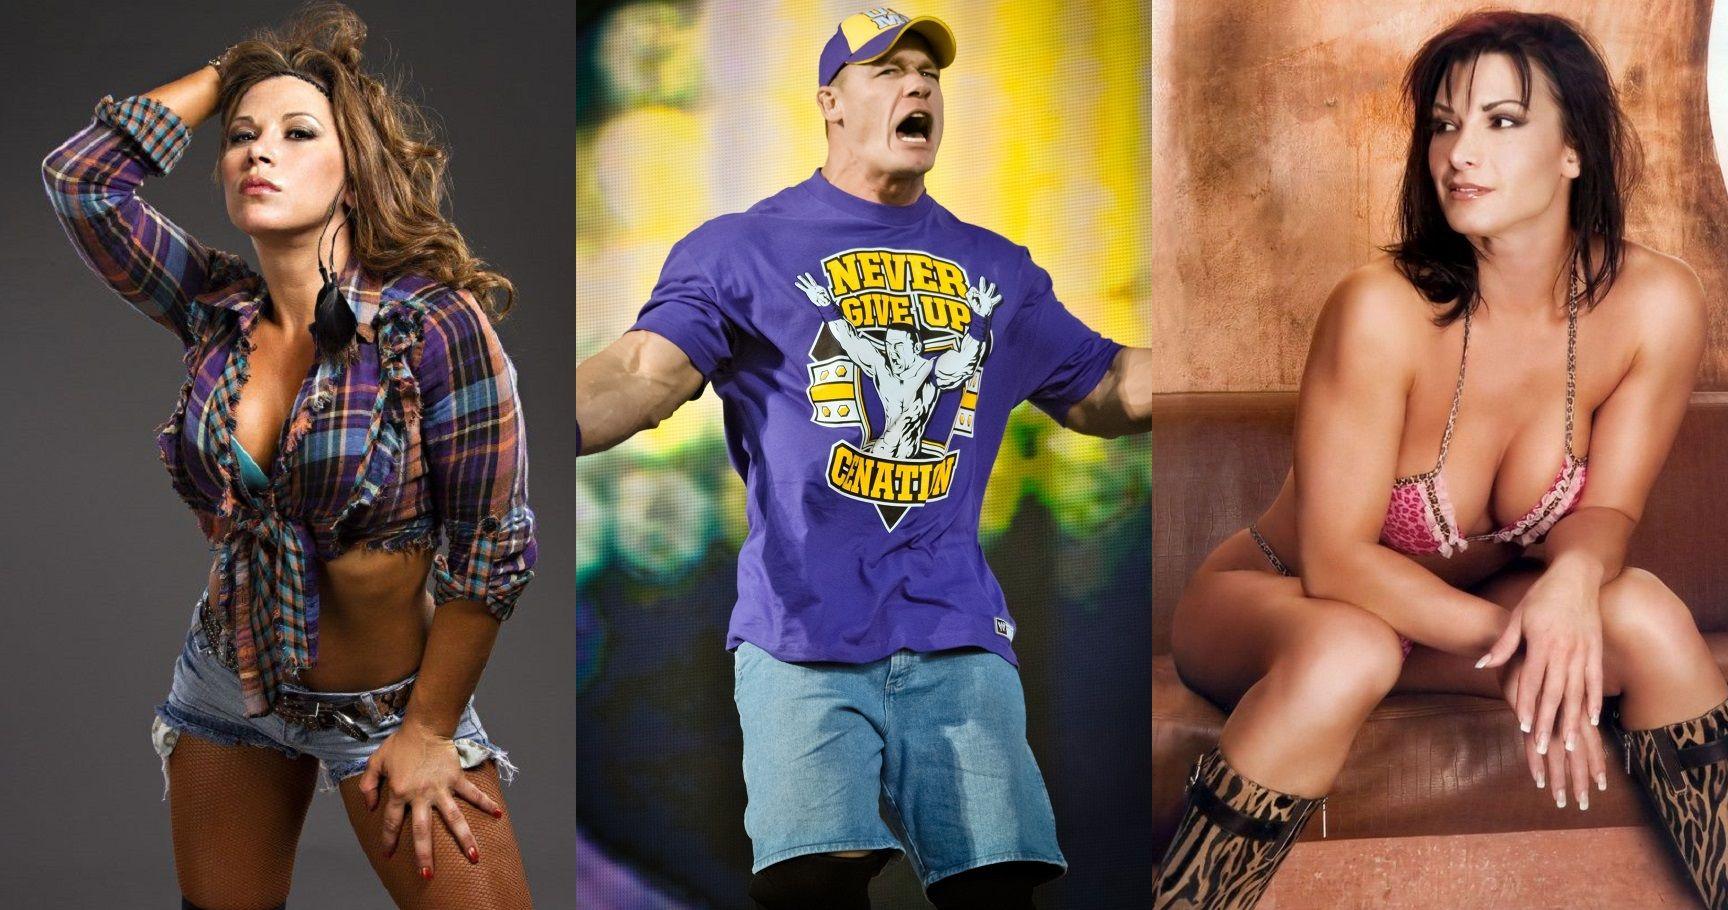 Top 13 Insane Real Life Stories Of John Cena